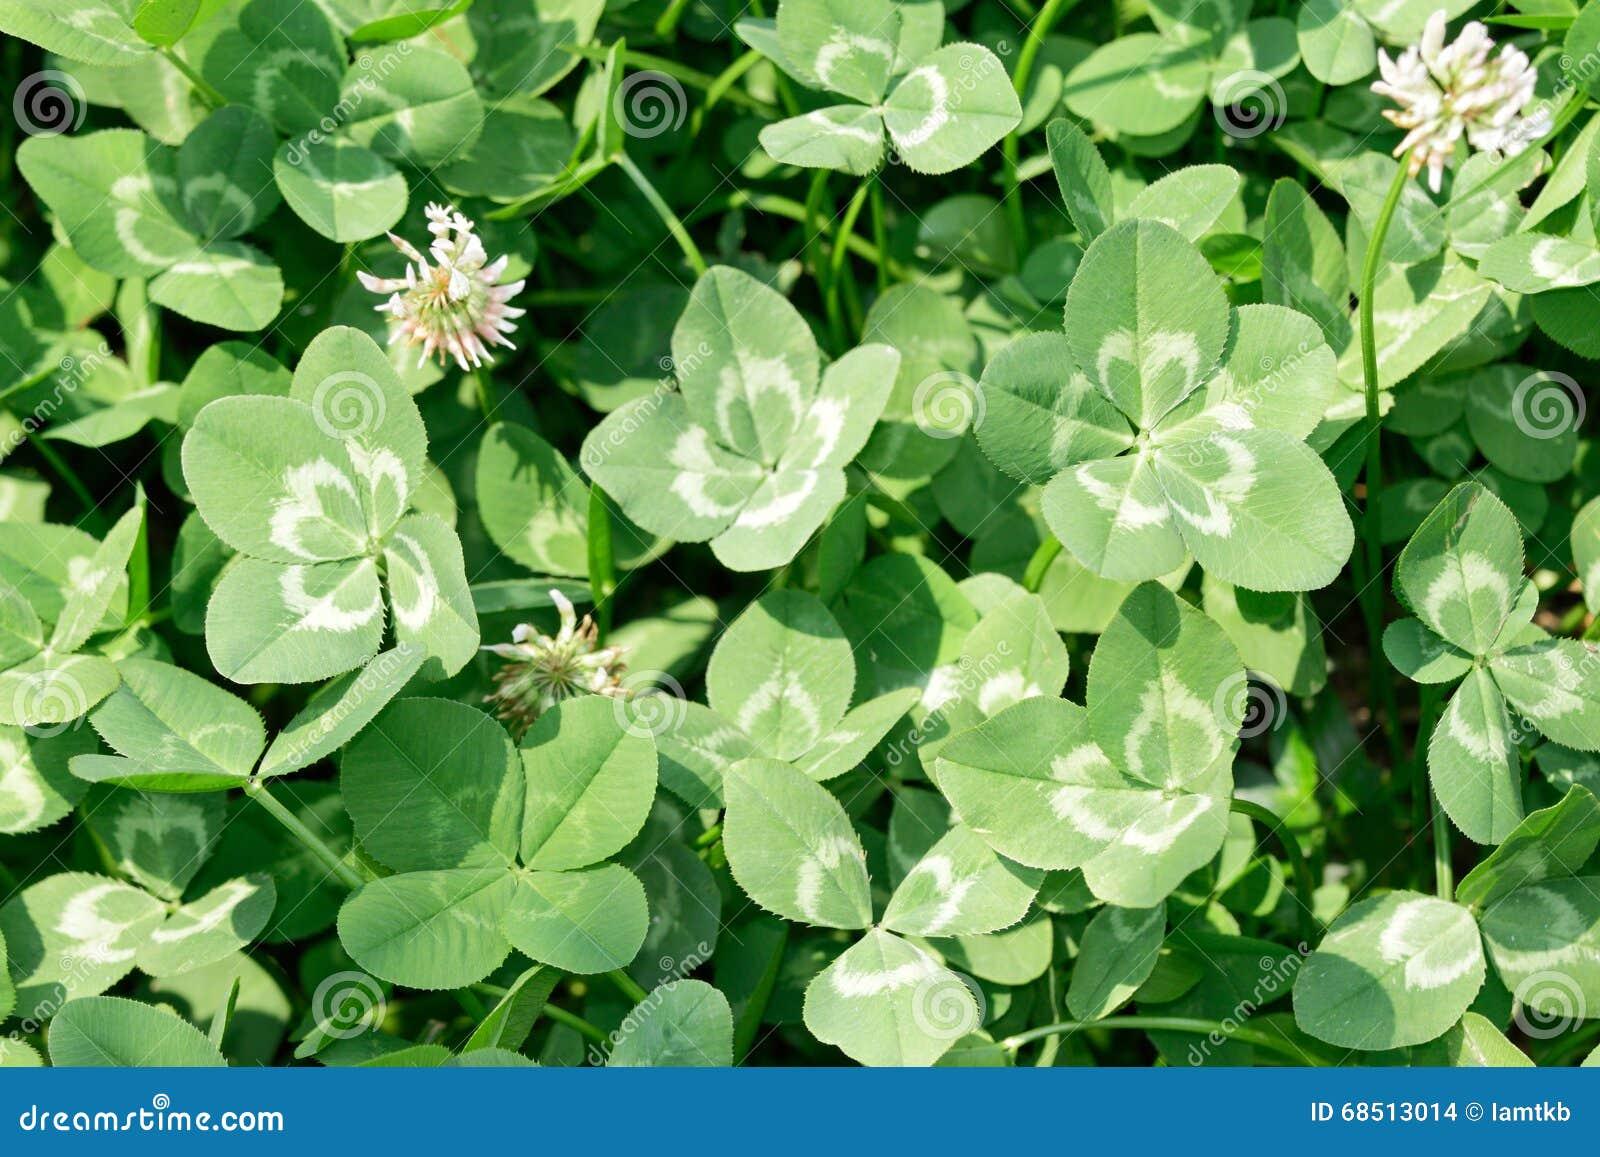 Multi Leaf Clover Stock Photo Image Of Patrick Flower